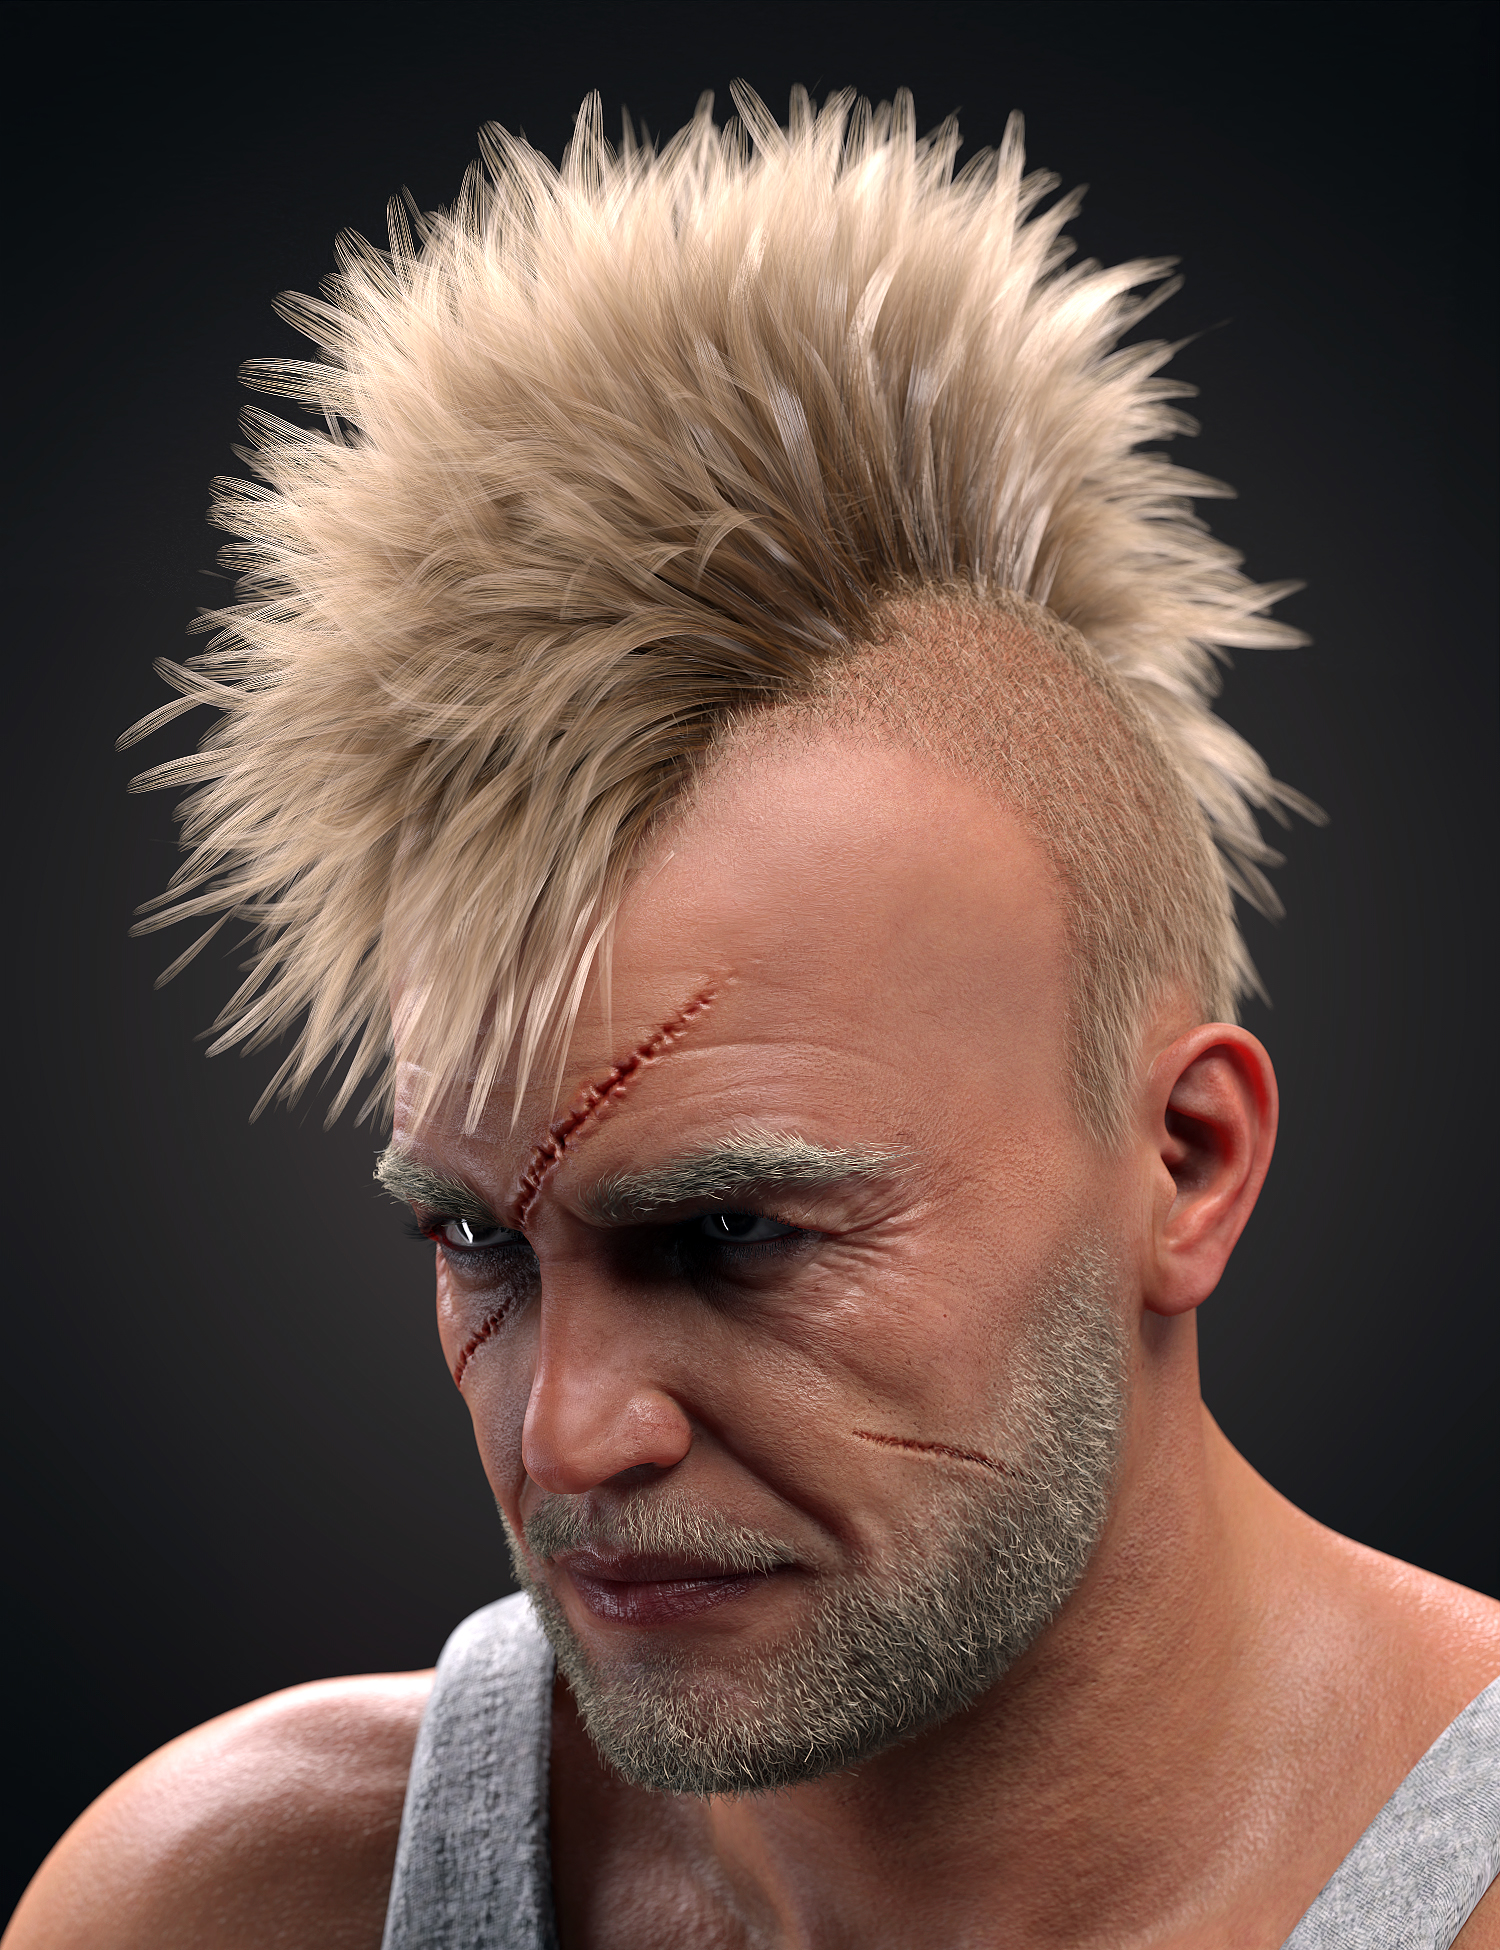 M3D Tough Guy Hair Set Genesis 8.1 Males by: Matari3D, 3D Models by Daz 3D